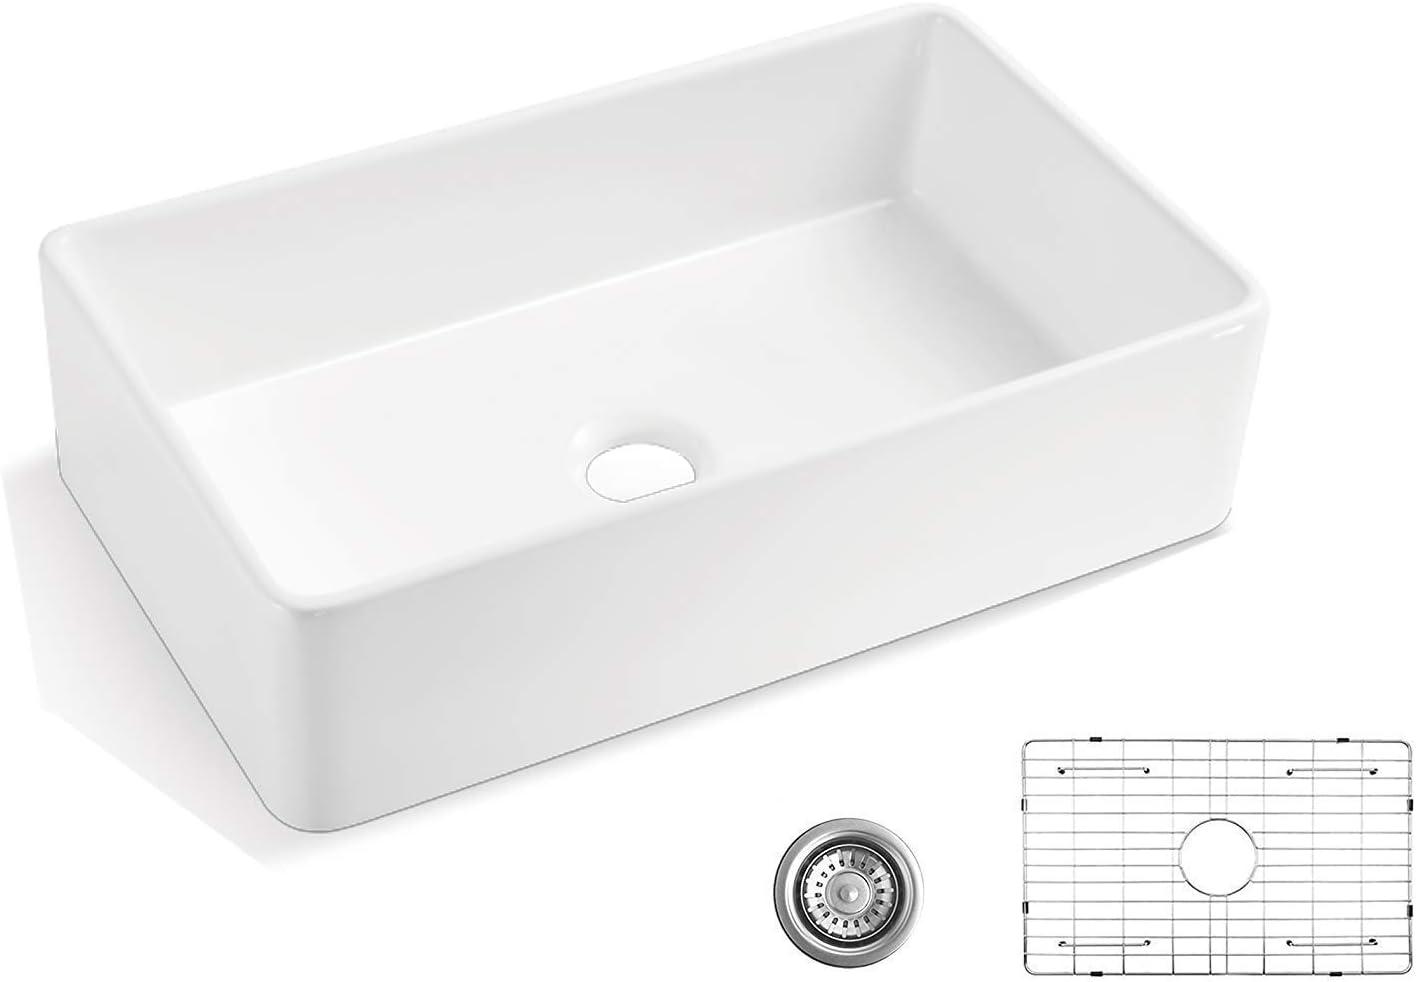 Alwen 33 White Farmhouse Sink Fireclay 33 Apron Front Sink Luxury Single Basin Kitchen Sink 33 Inch Farmhouse Sink White Ceramic Sink With Stainless Steel Grid And Strainer Amazon Com